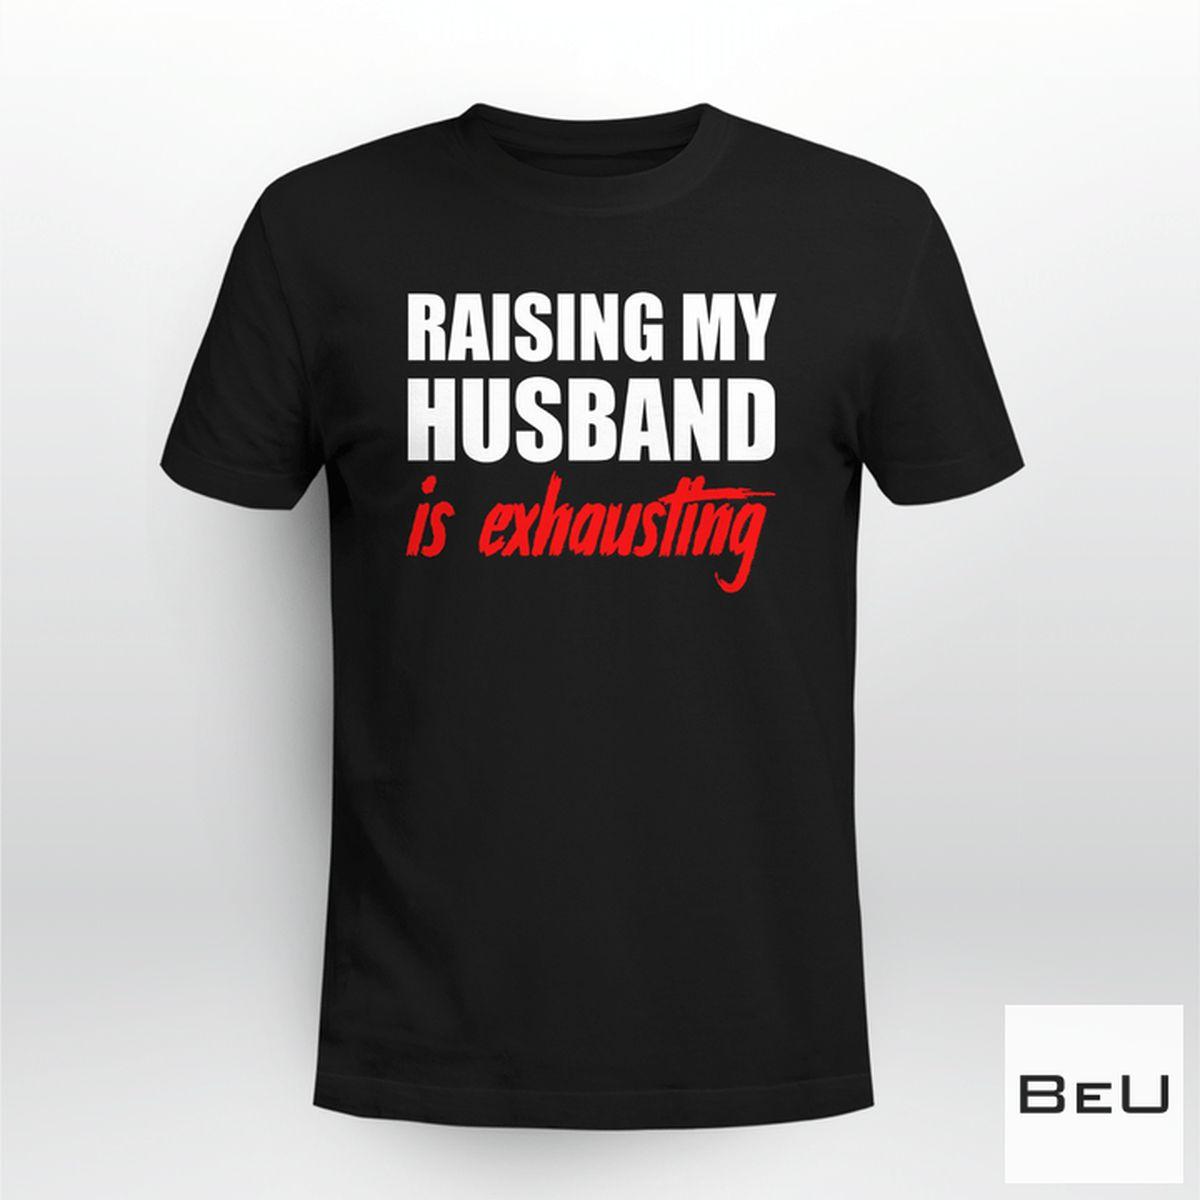 Raising My Husband Is Exhausting Shirt